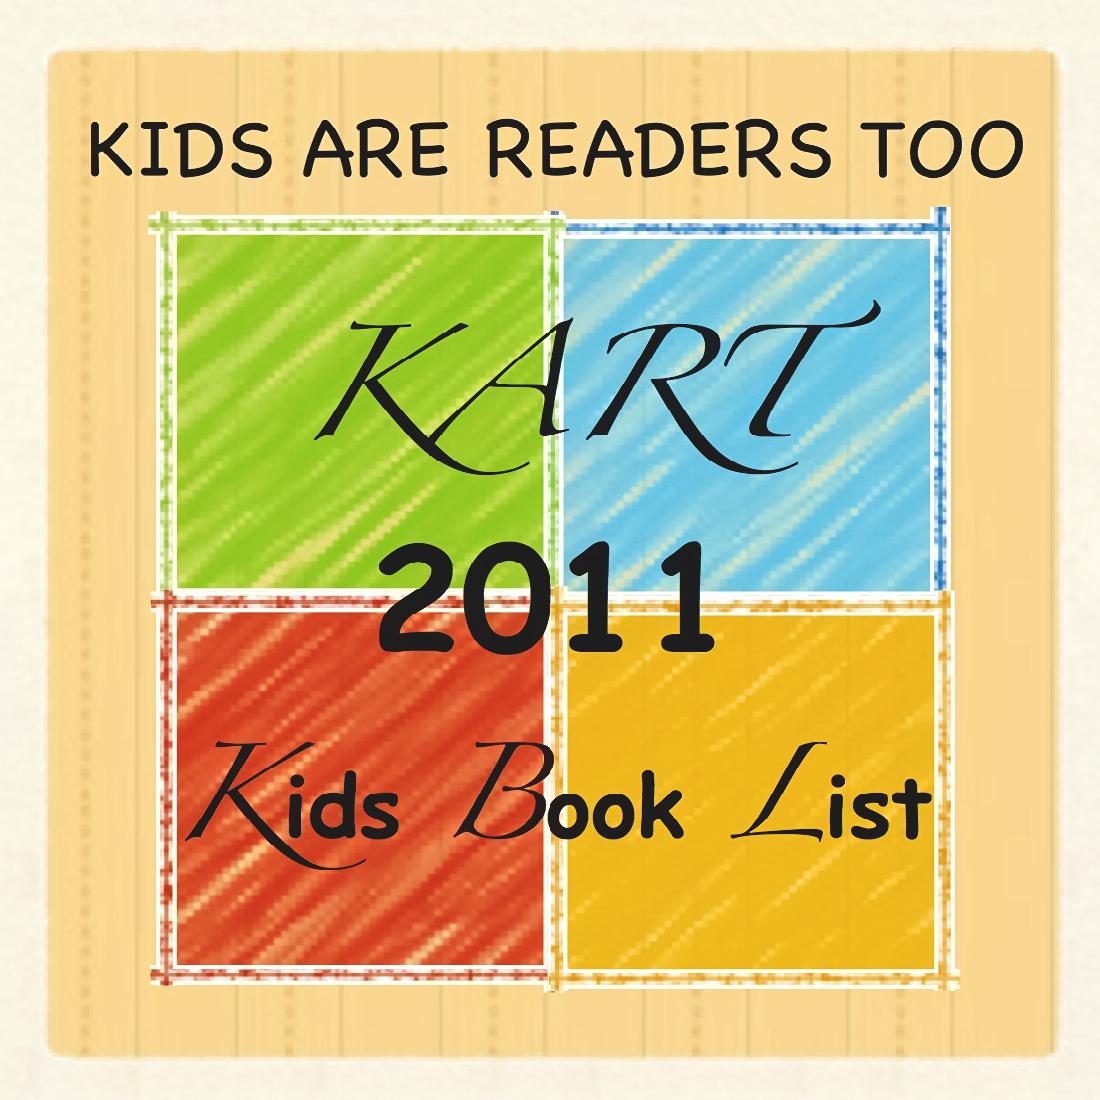 2011_Kart_Kids_Book_List_Web_Badge.jpg